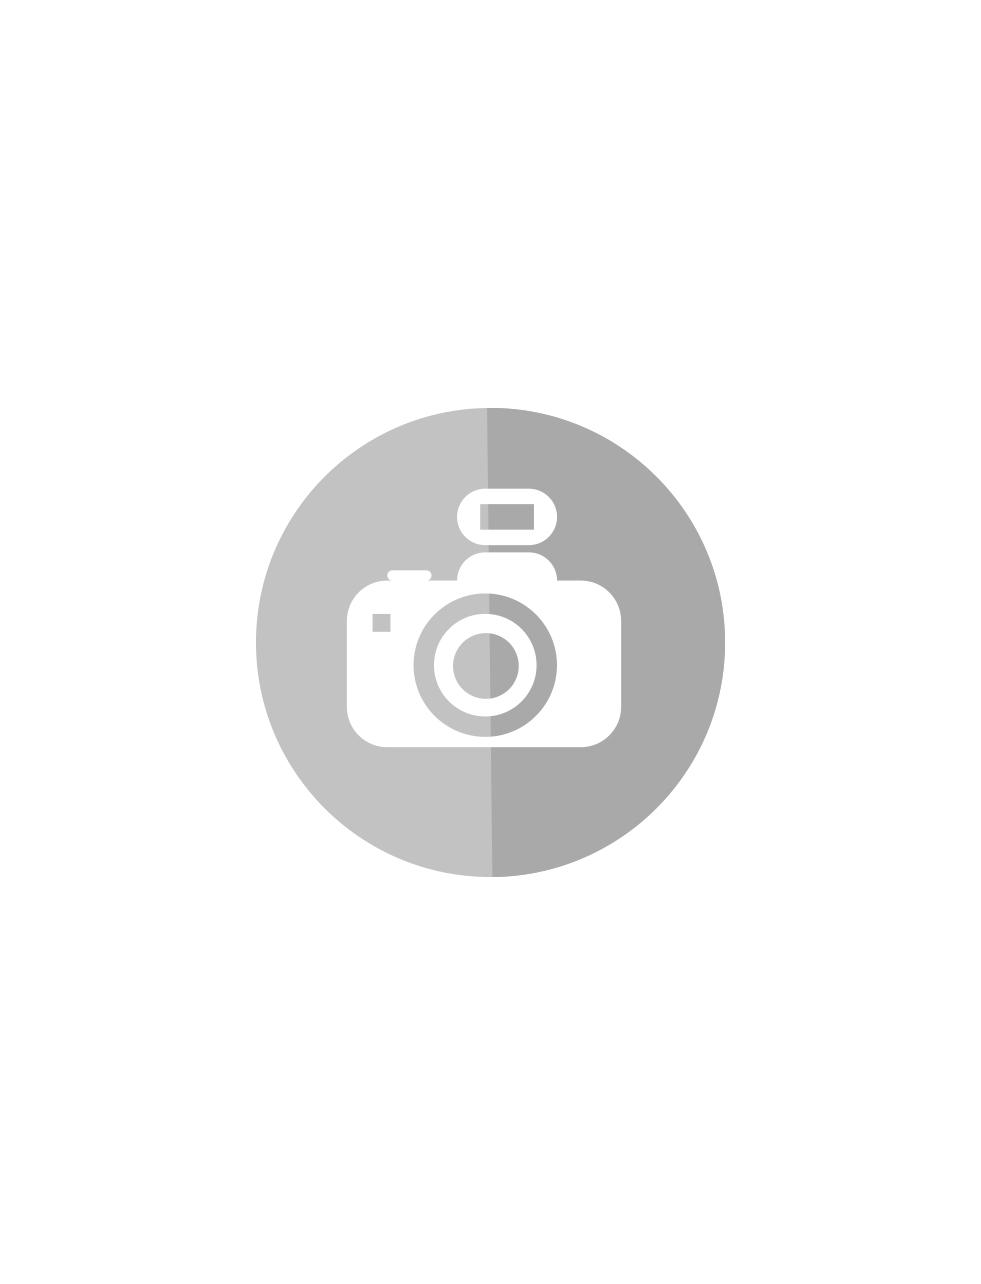 category_image_ARCHIV